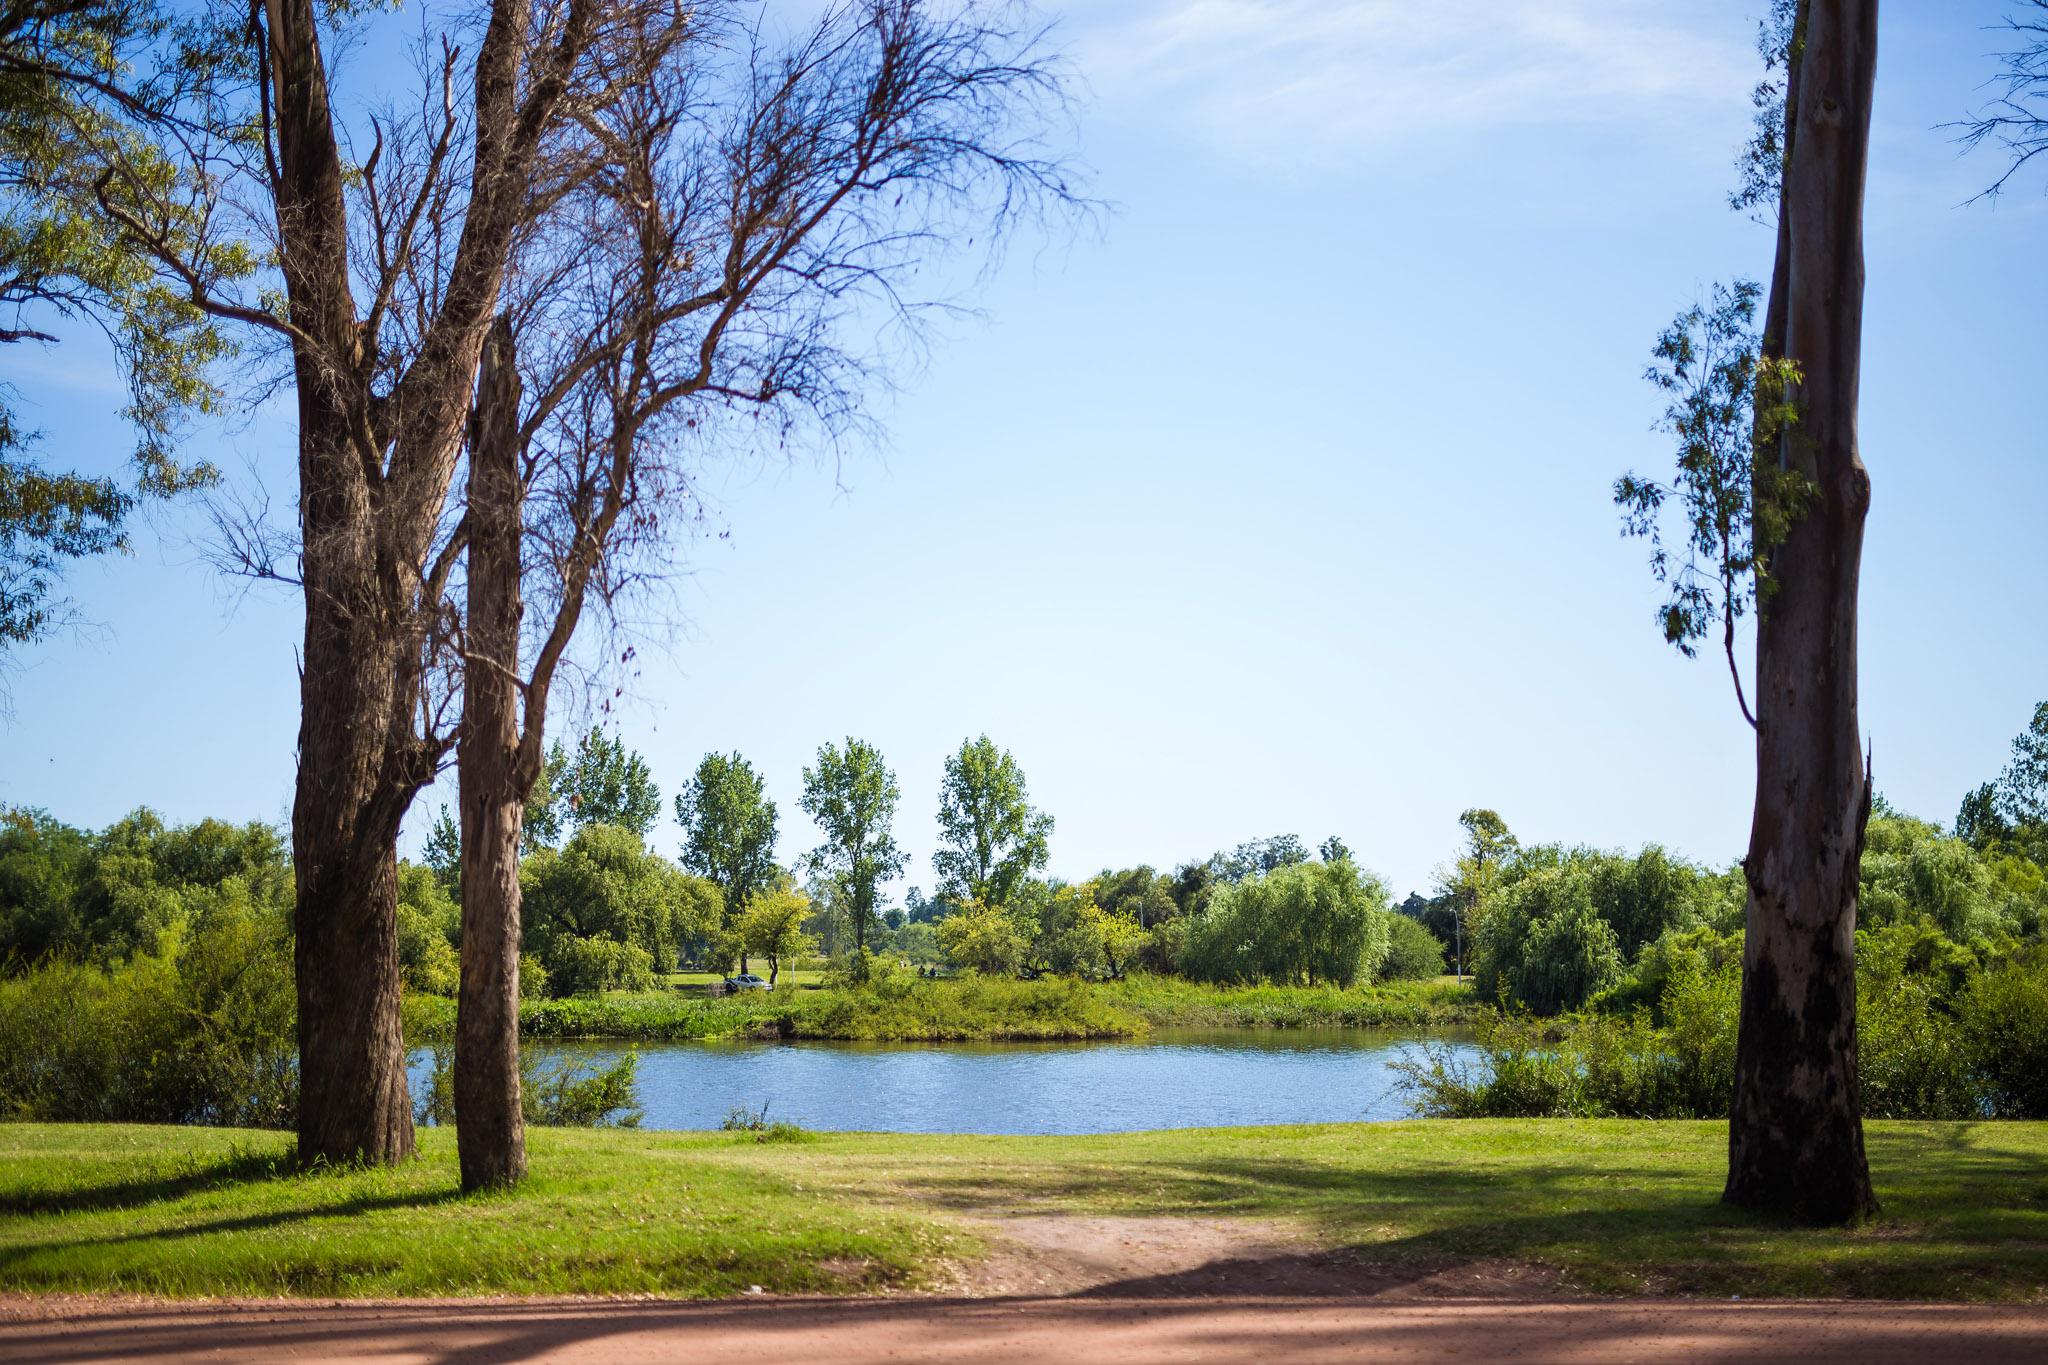 wedding-travellers-destination-photography-overlanding-south-america-uruguay-mercedes-park-river